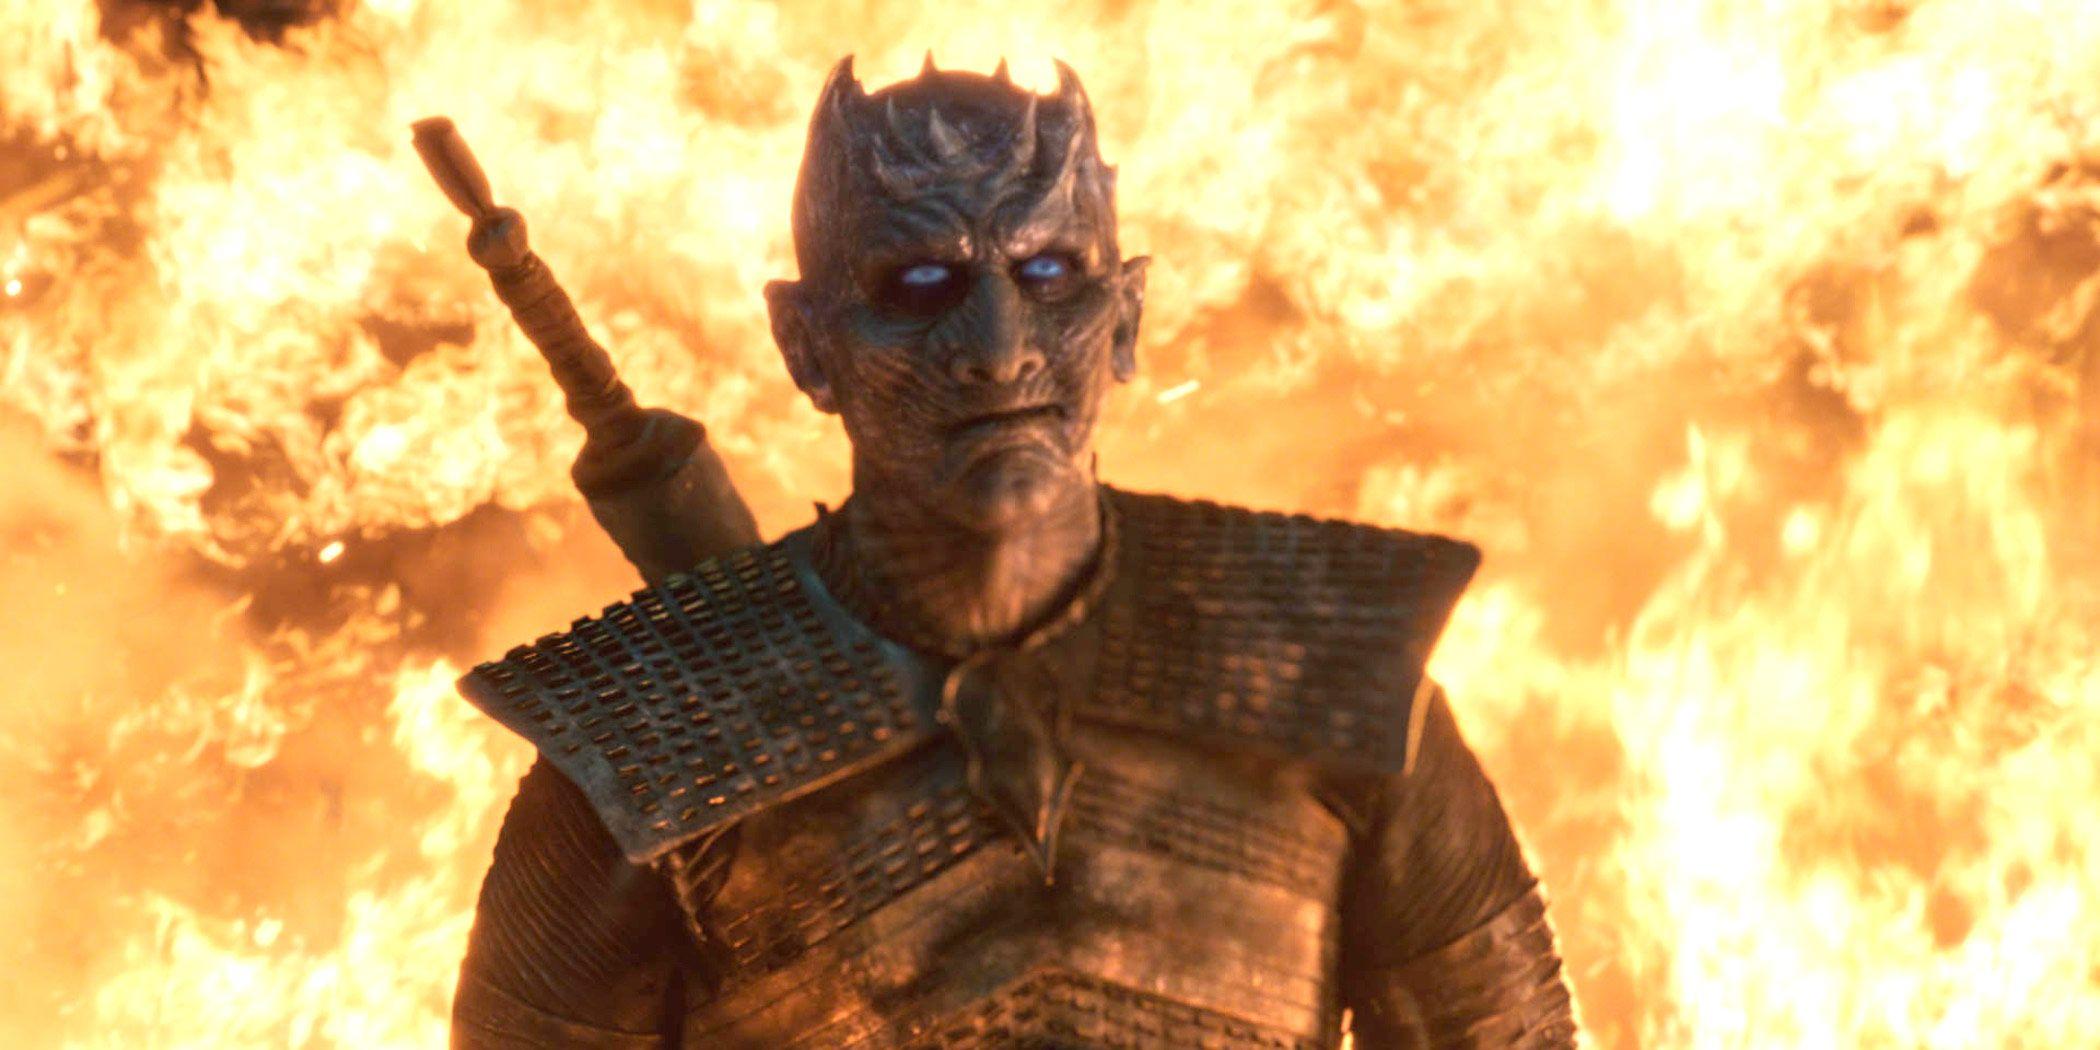 The Night King, Game of Thrones, season 8 episode 3